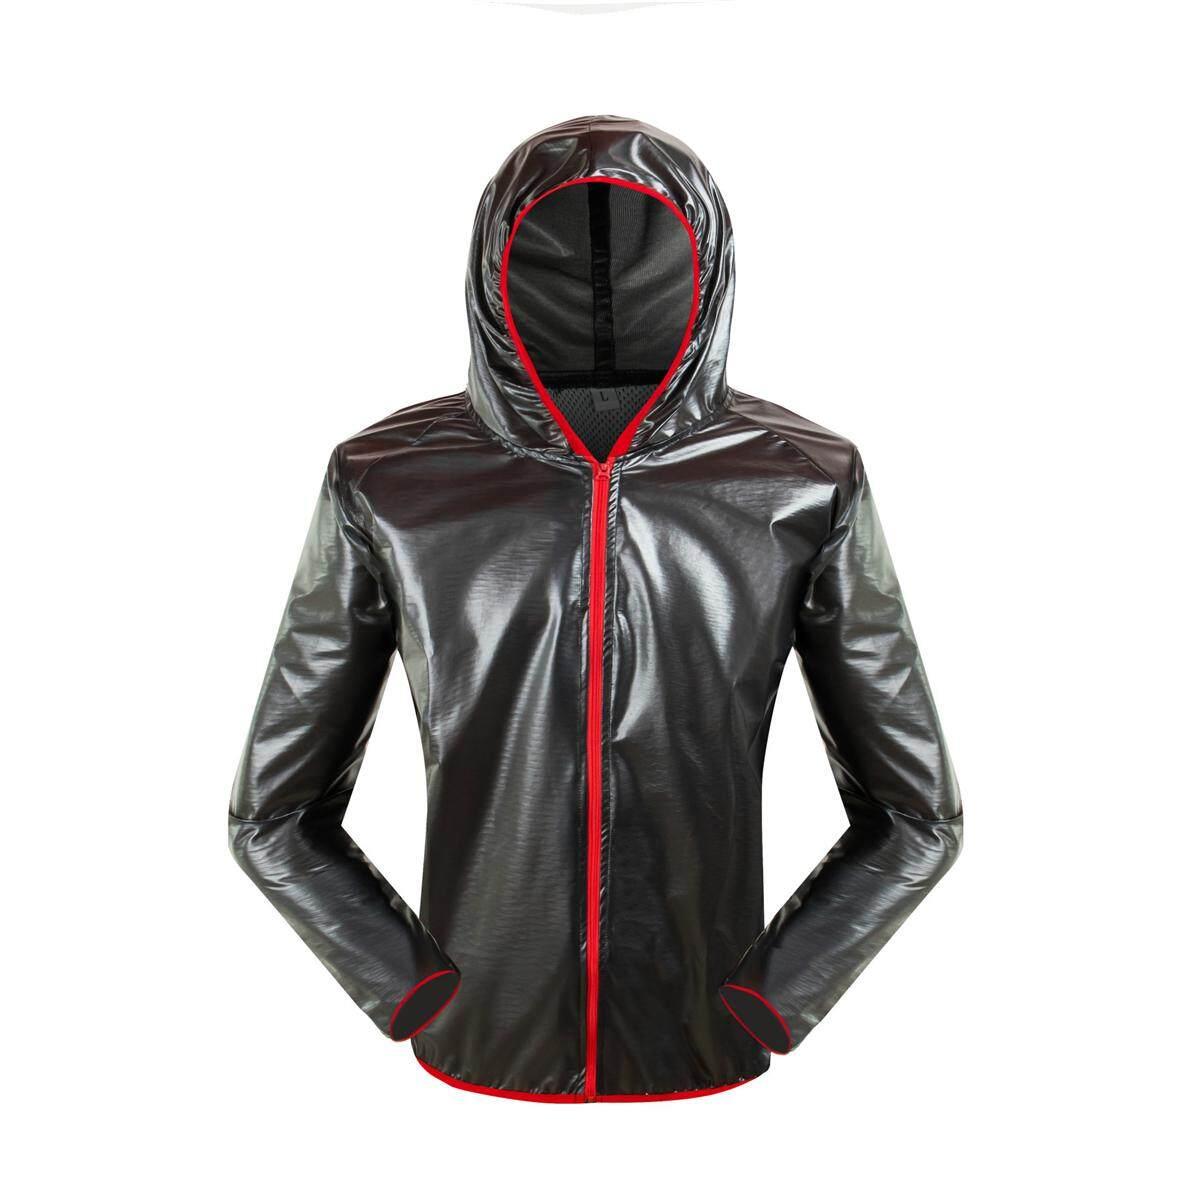 Motor Tahan Air Unisex Jas Hujan Balap Ultra Tipis Beathable Portable Skinsuit Pakaian Abu-abu Tua L